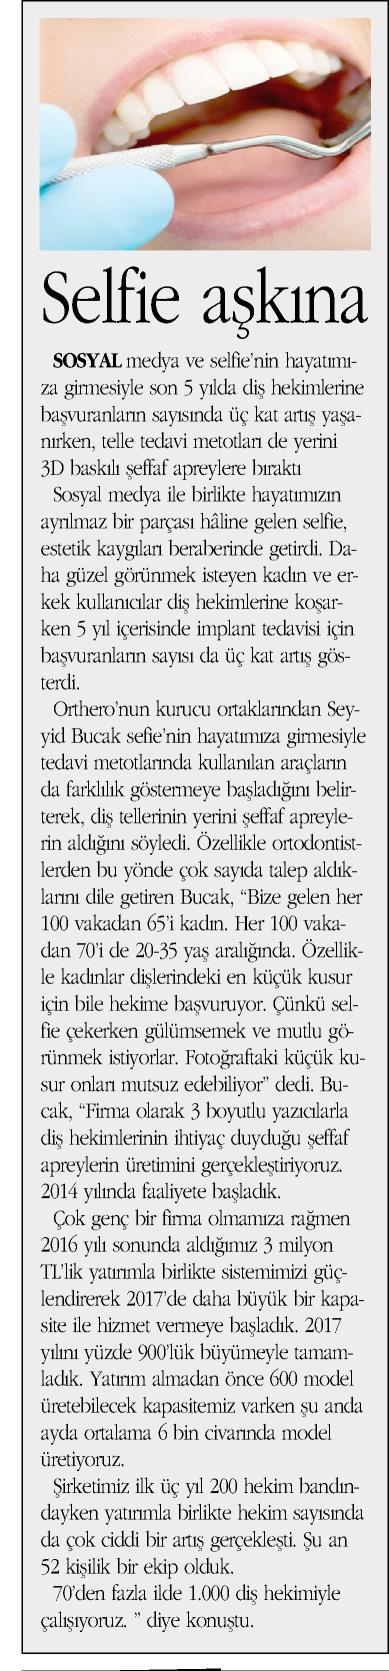 ORTADOĞU_20180309_13